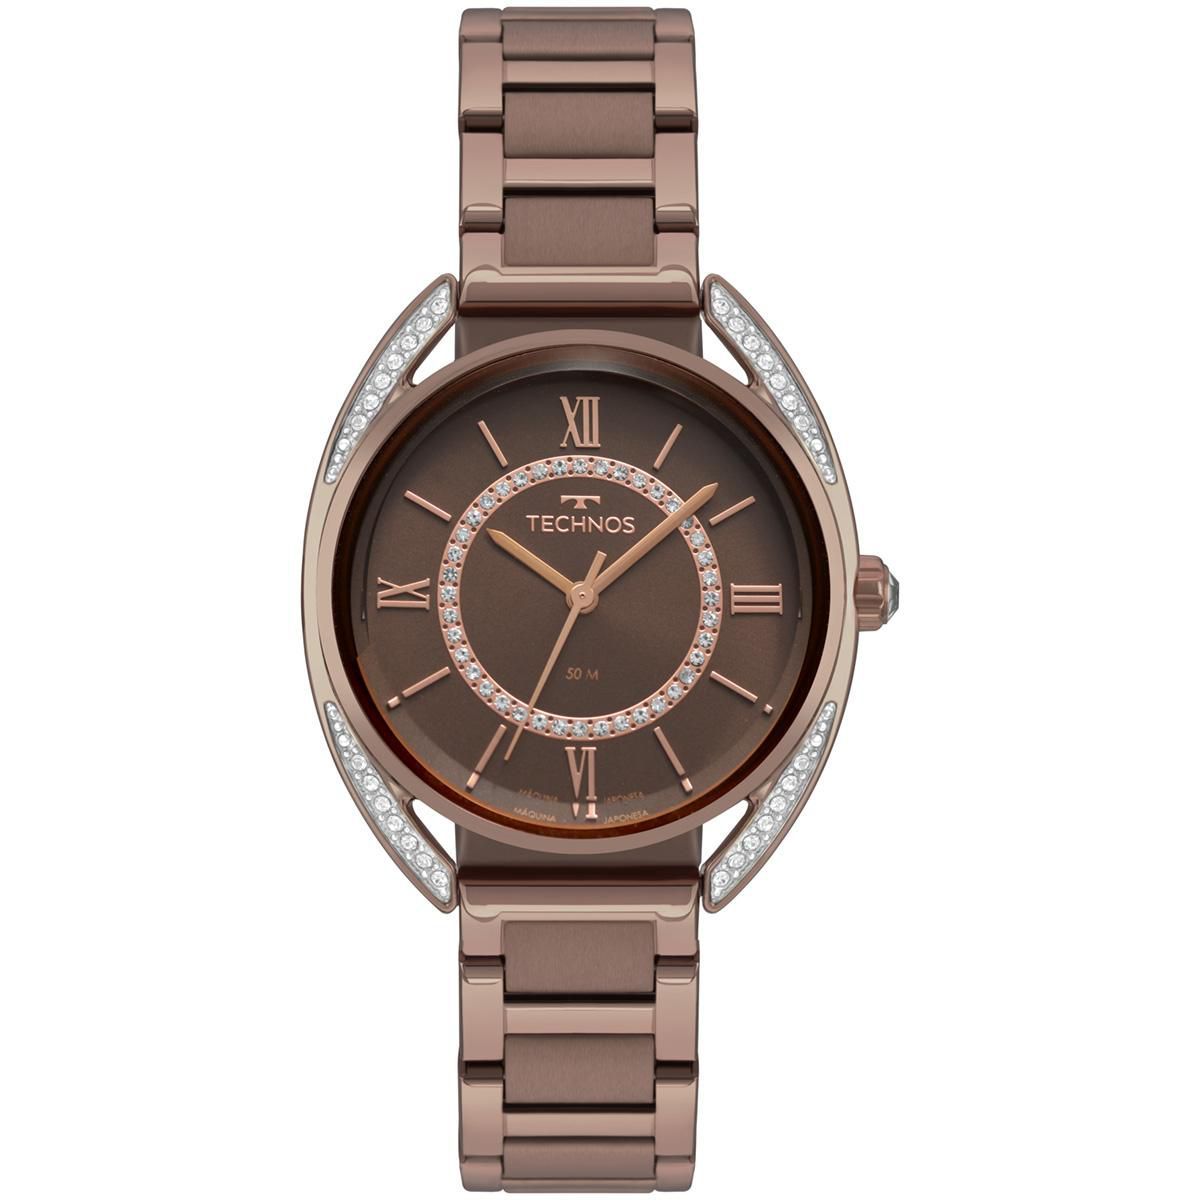 Relógio Feminino Technos Elegance Crystal 2035MRE/4M 36mm Aço Marrom